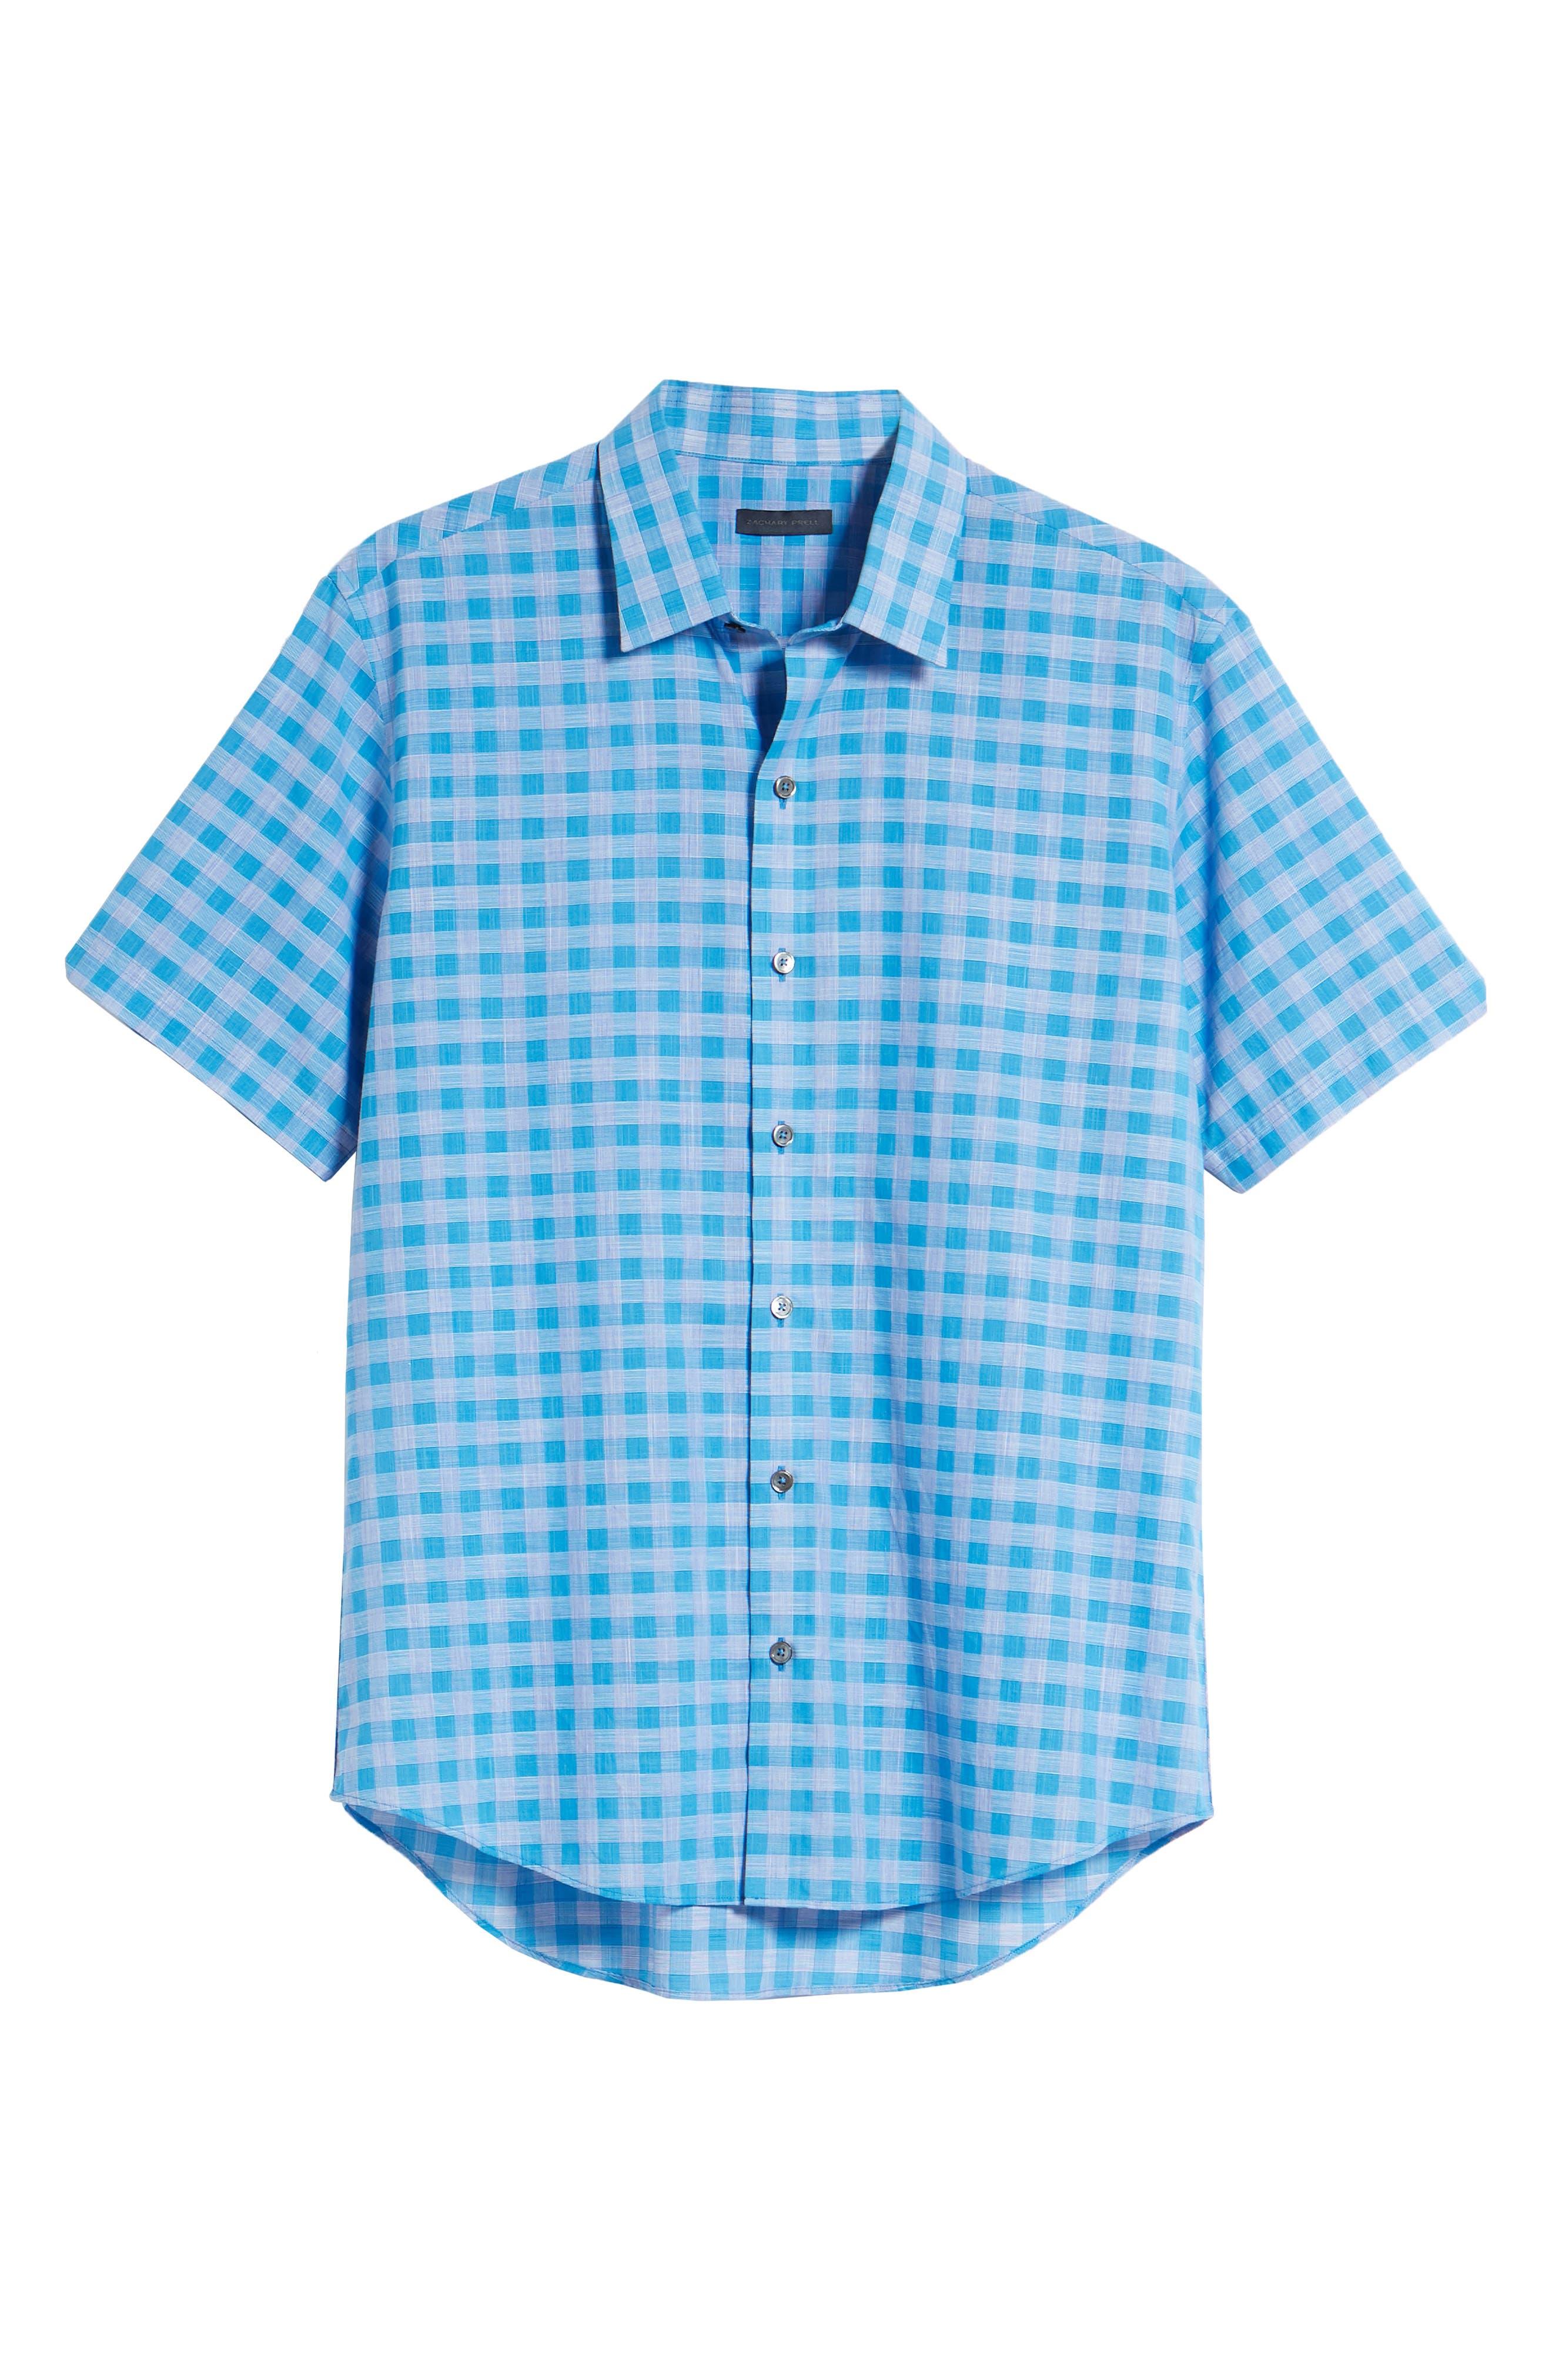 Ruder Regular Fit Check Sport Shirt,                             Alternate thumbnail 6, color,                             430